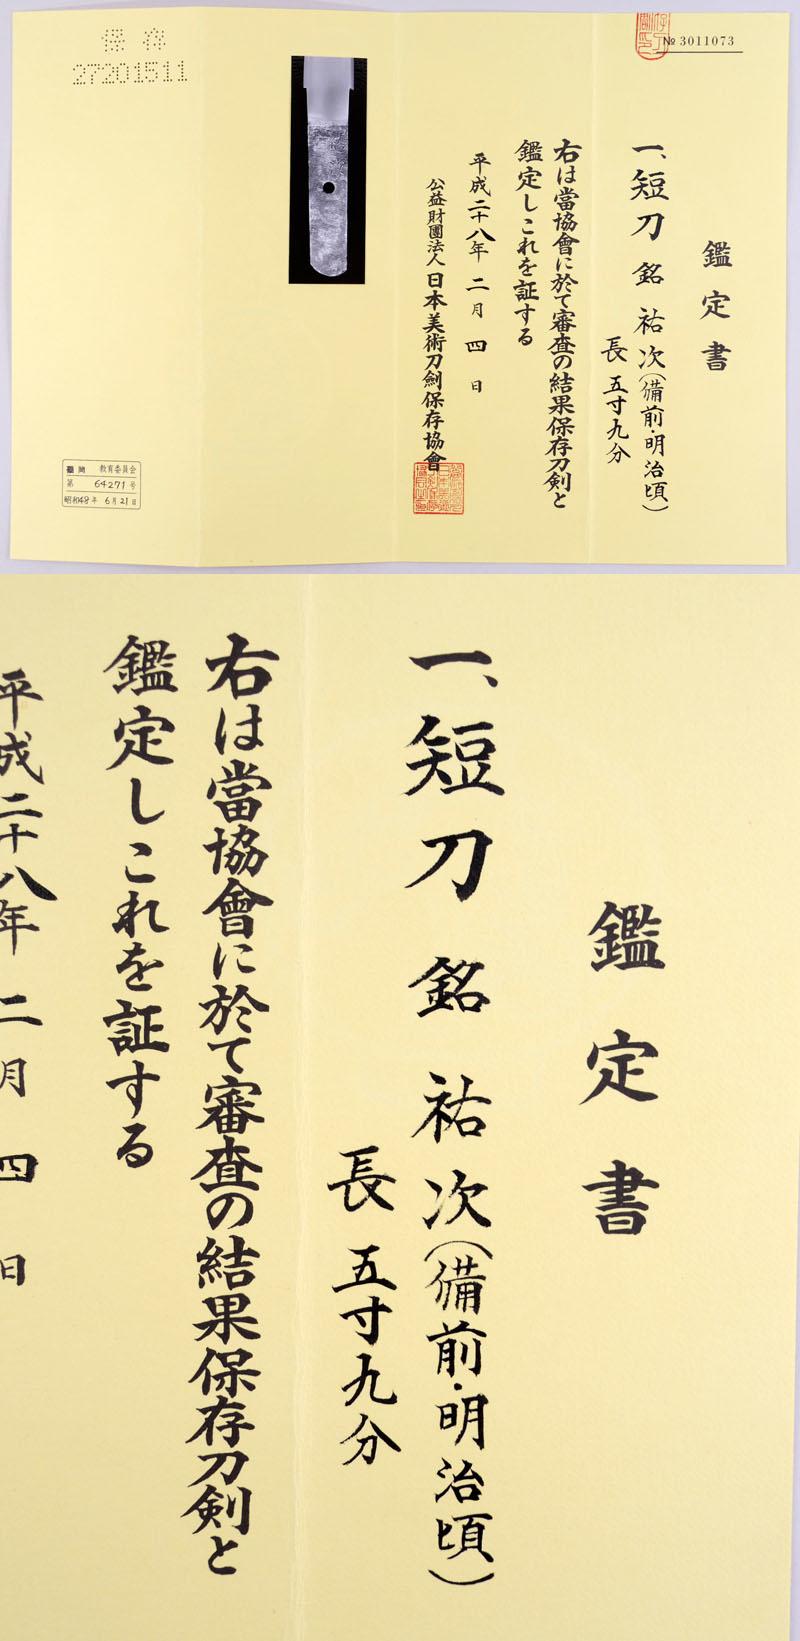 祐次(横山祐次) Picture of Certificate